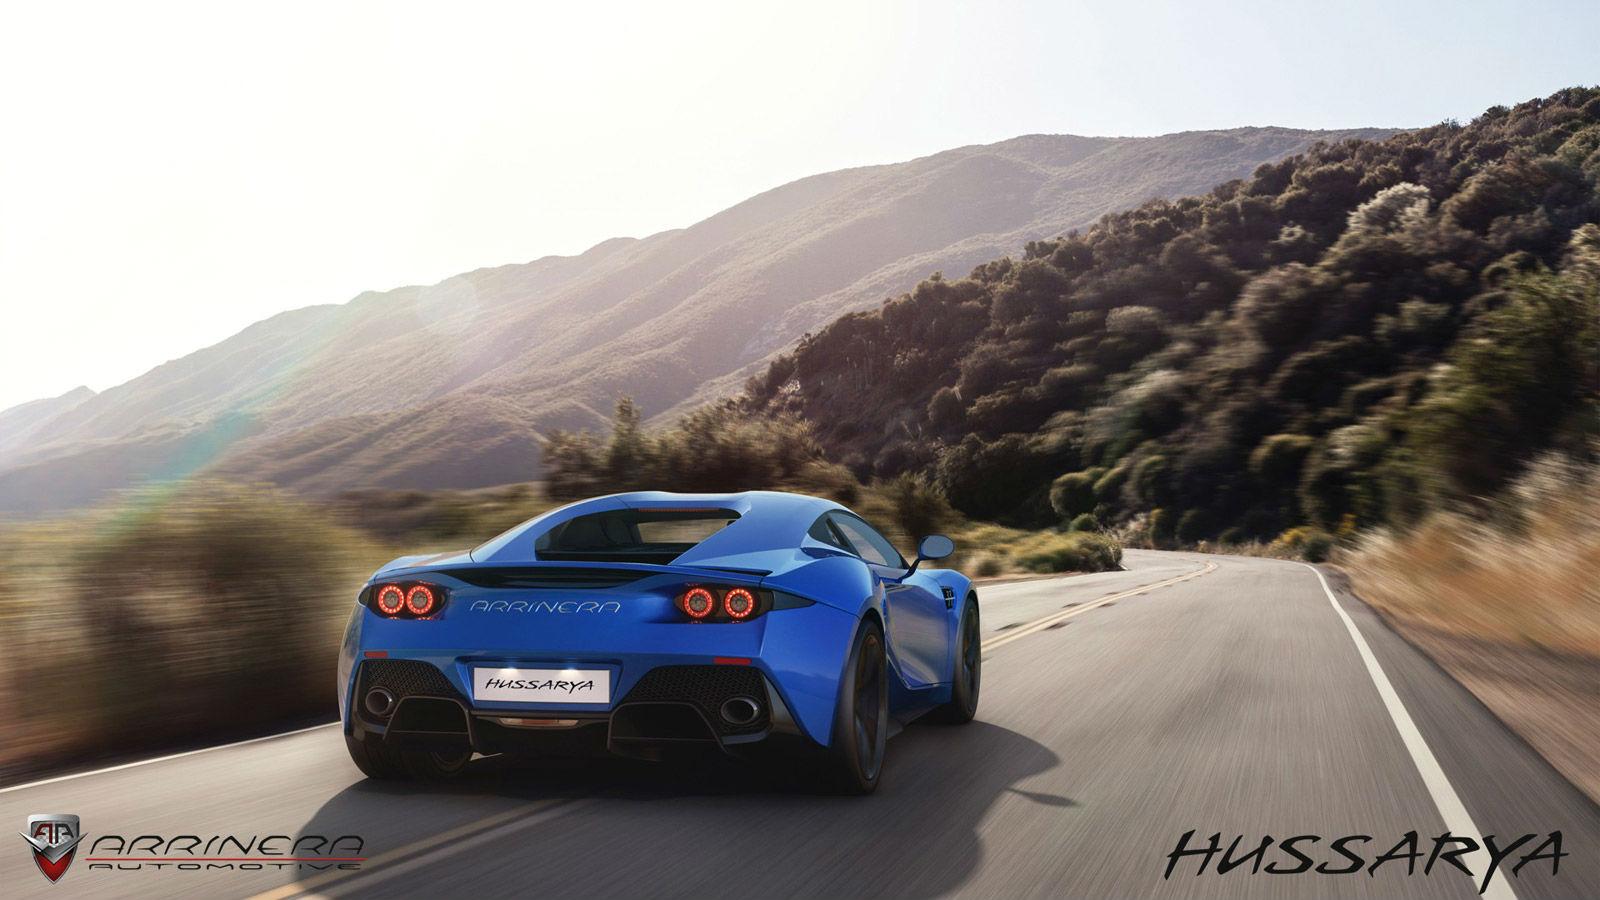 Arrinera Hussarya Rear End Blue Version No Car No Fun Muscle